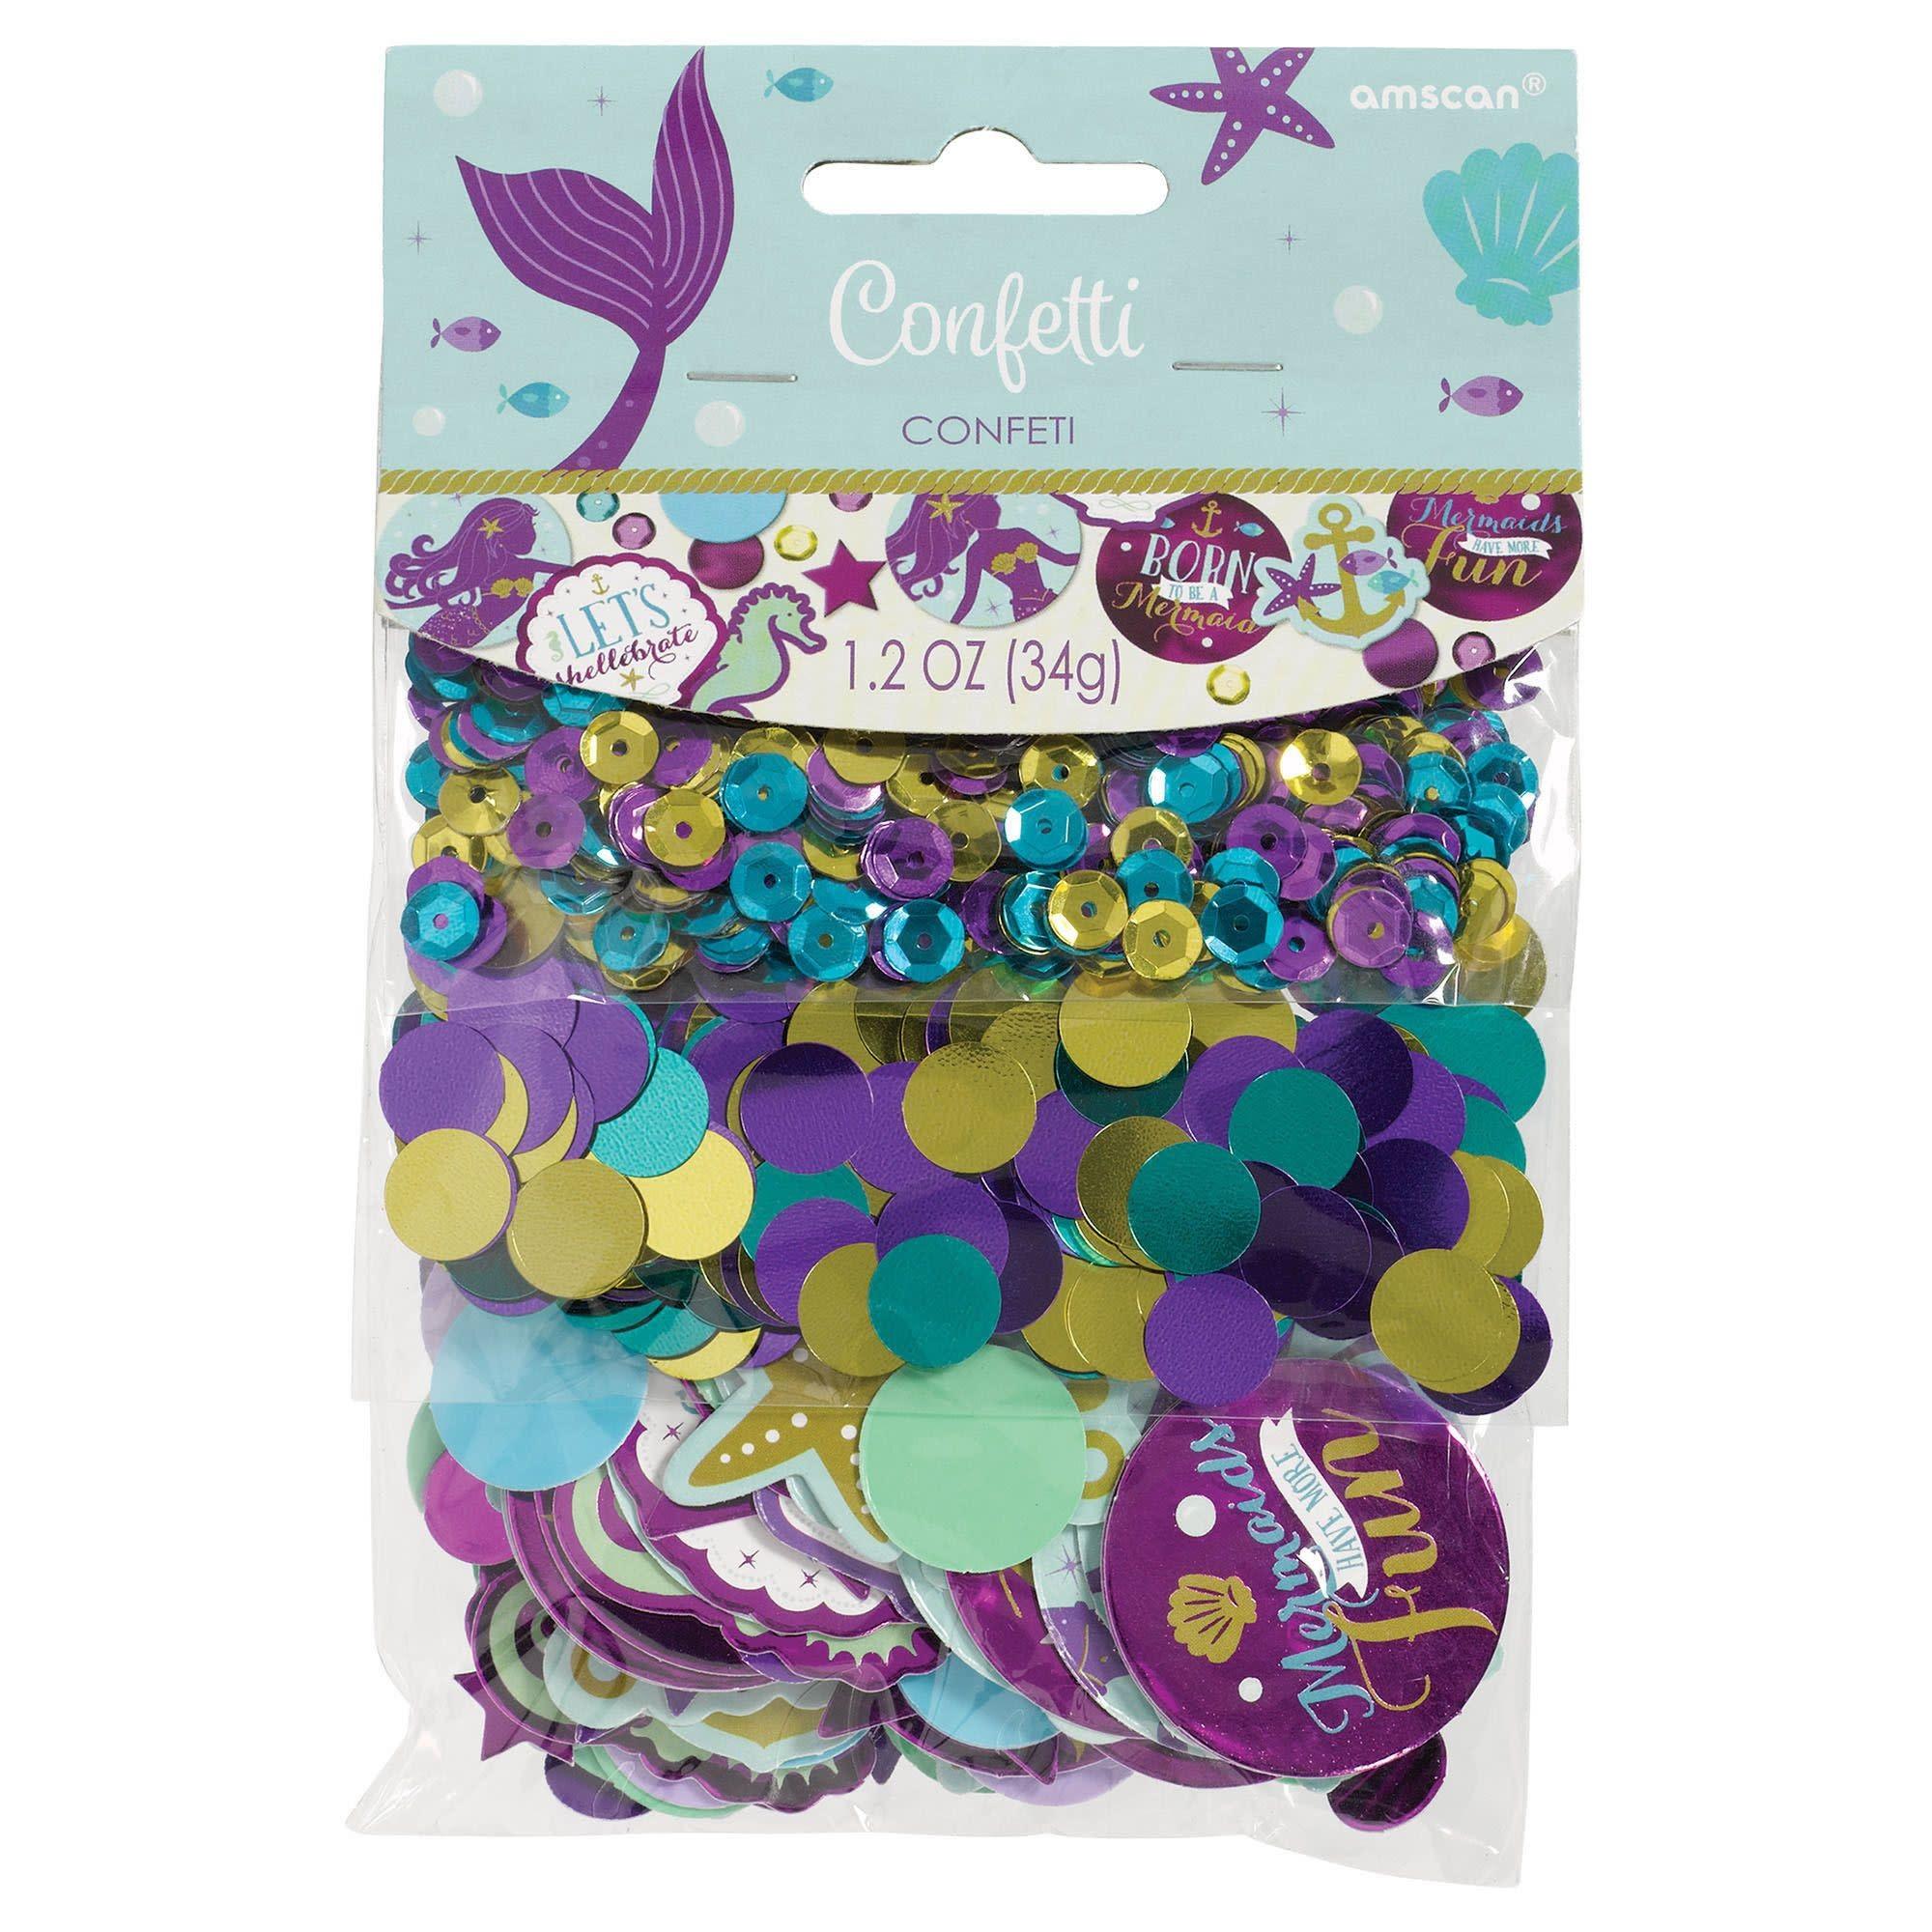 Mermaid Wishes Sequin/Foil/Paper Confetti